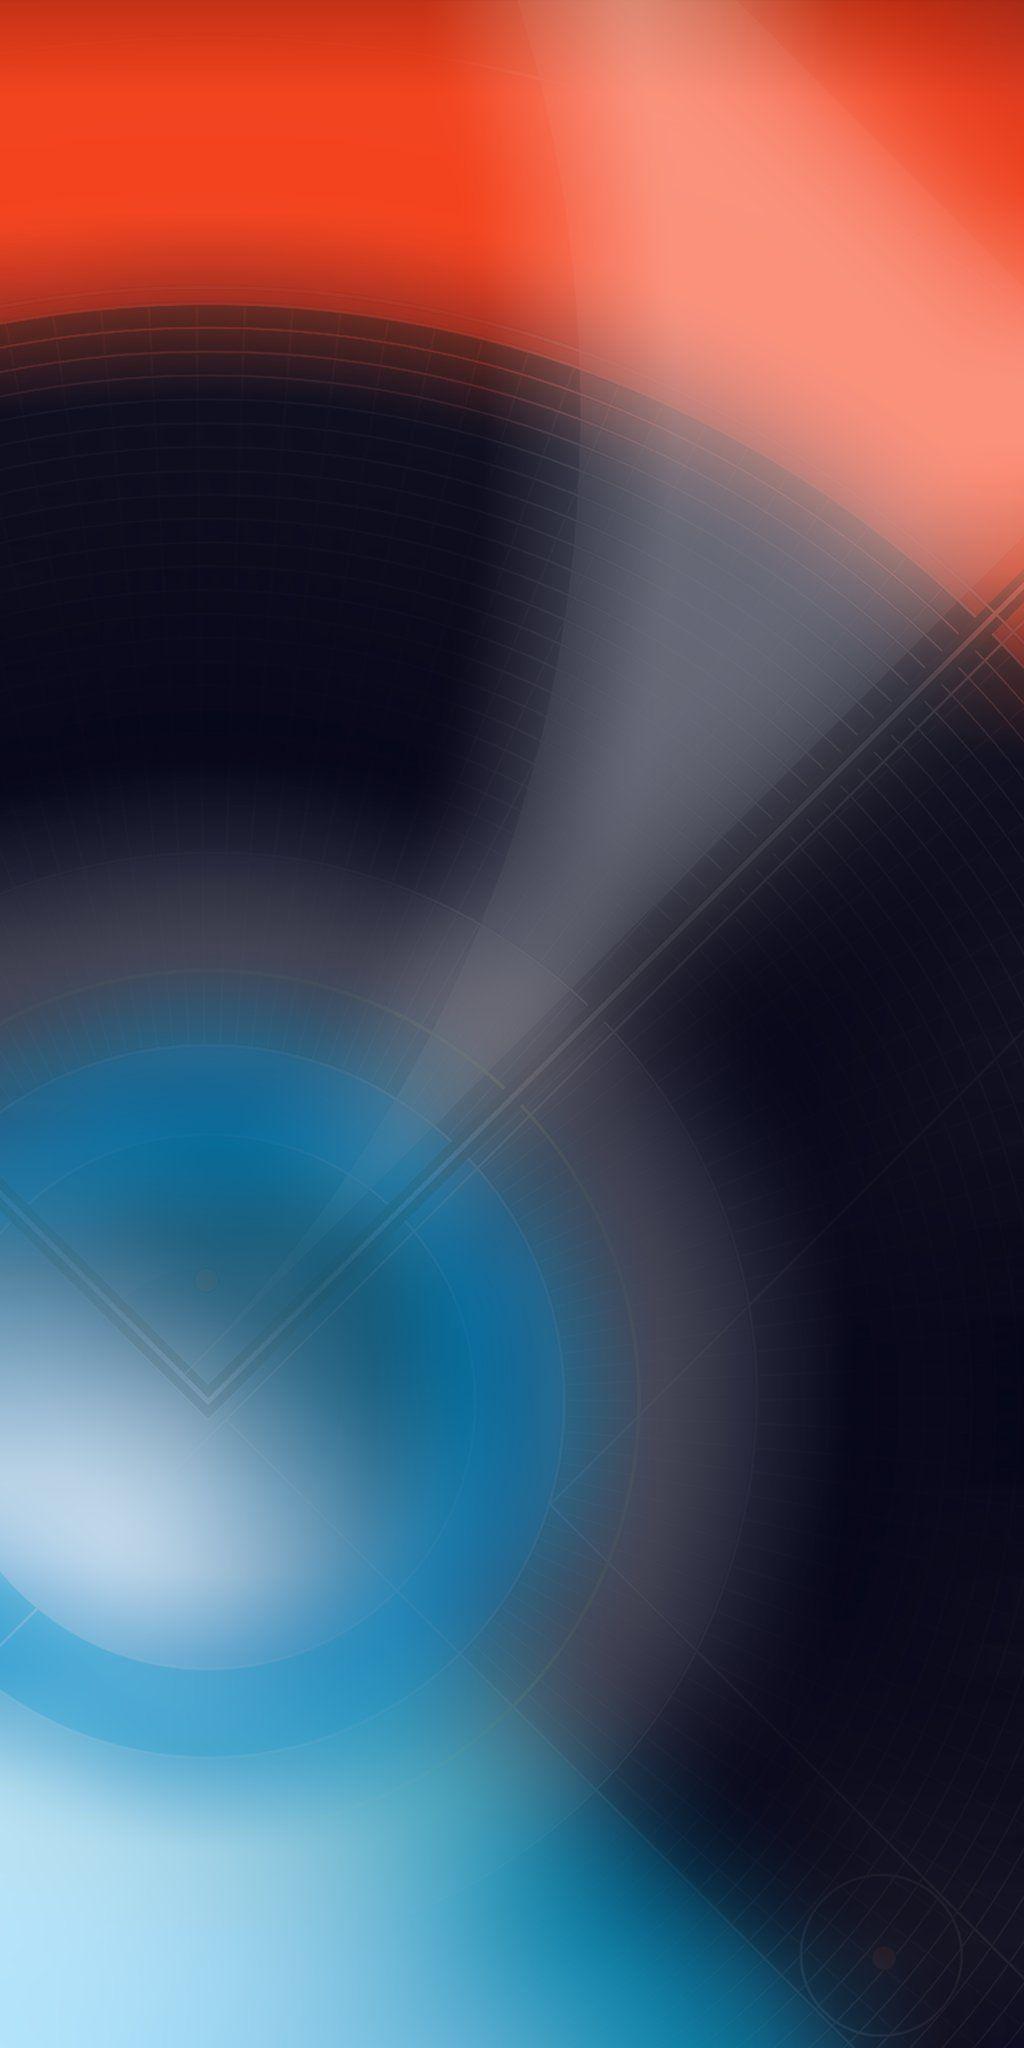 IOS 14 HD Wallpapers - Wallpaper Cave